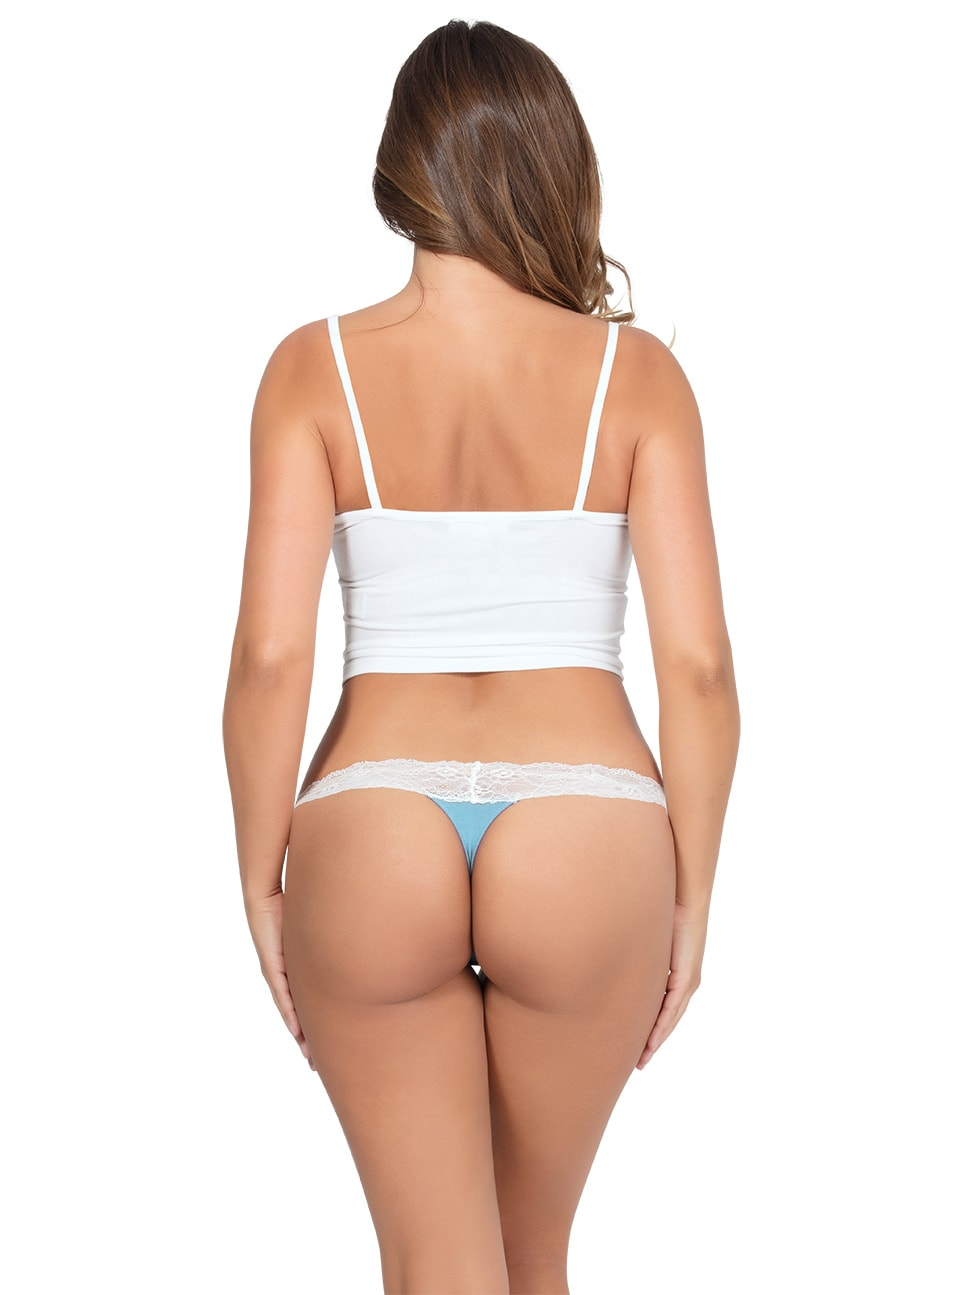 PARFAIT ParfaitPanty SoEssential ThongPP303 SkyBlueIvory Back copy - Parfait Panty So Essential Thong- Skyblue - PP403